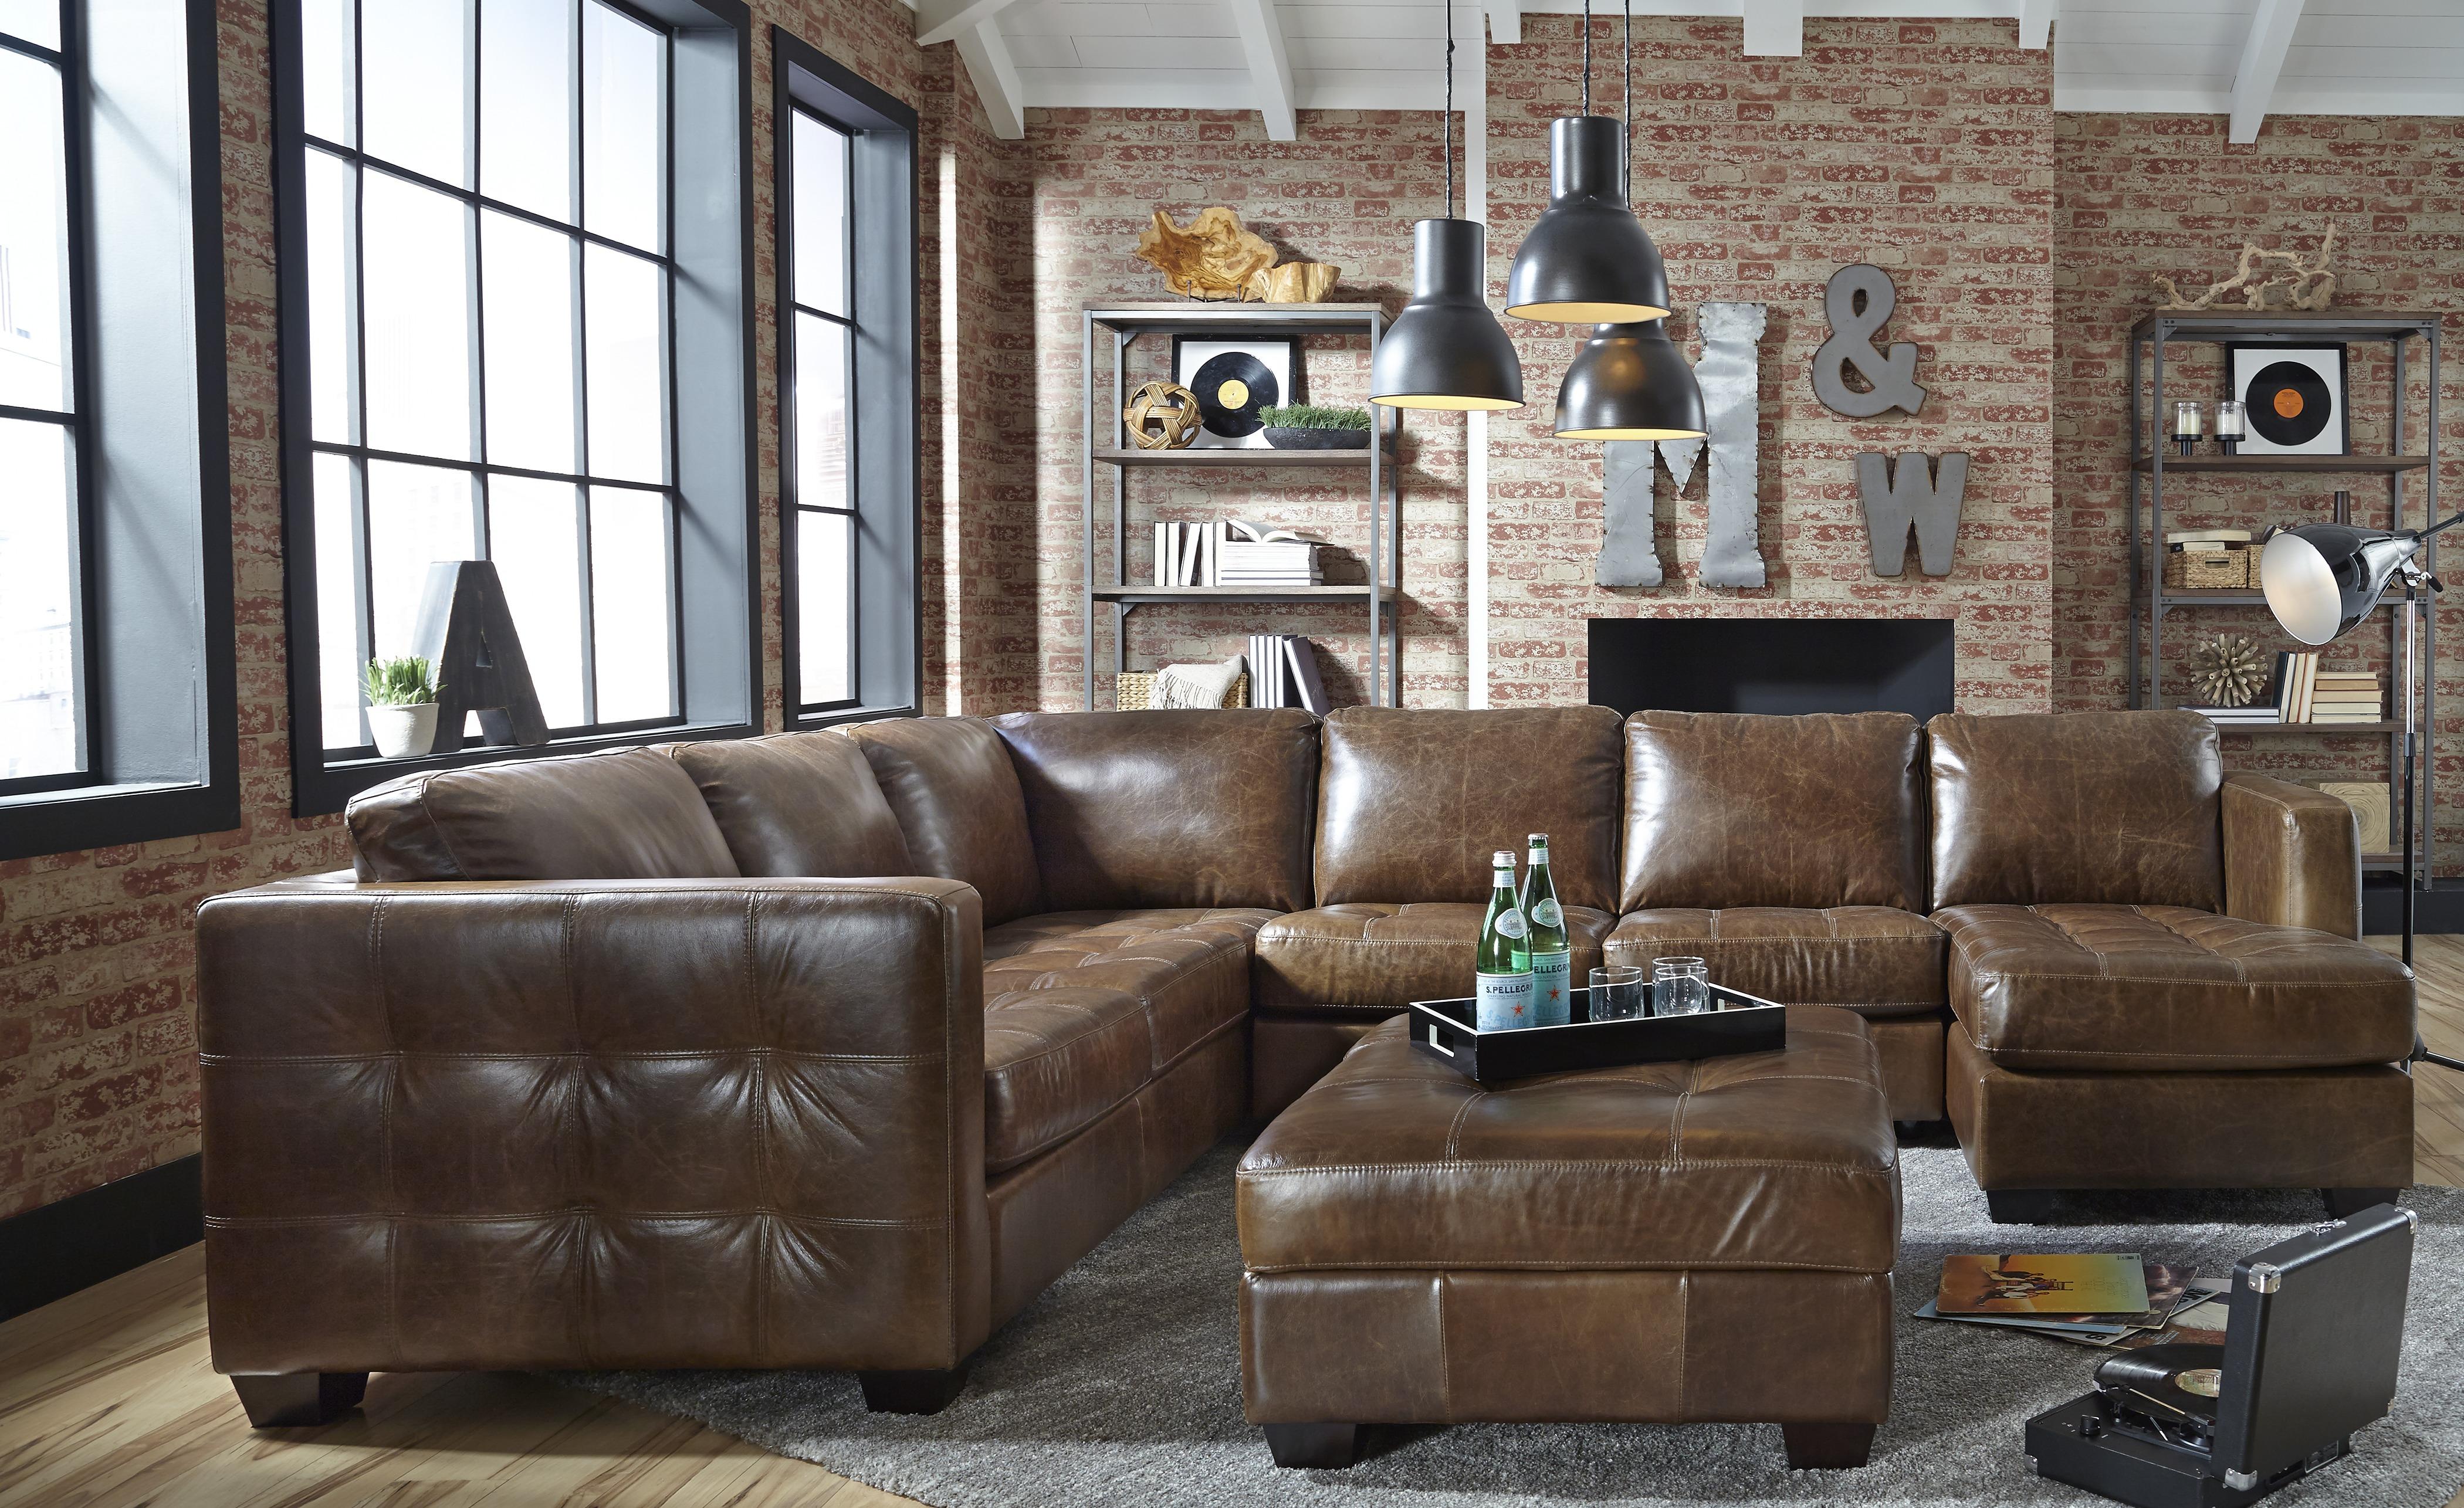 Enjoyable Barrett 77558 70558 Sectional 350 Fabrics Sofas And Theyellowbook Wood Chair Design Ideas Theyellowbookinfo